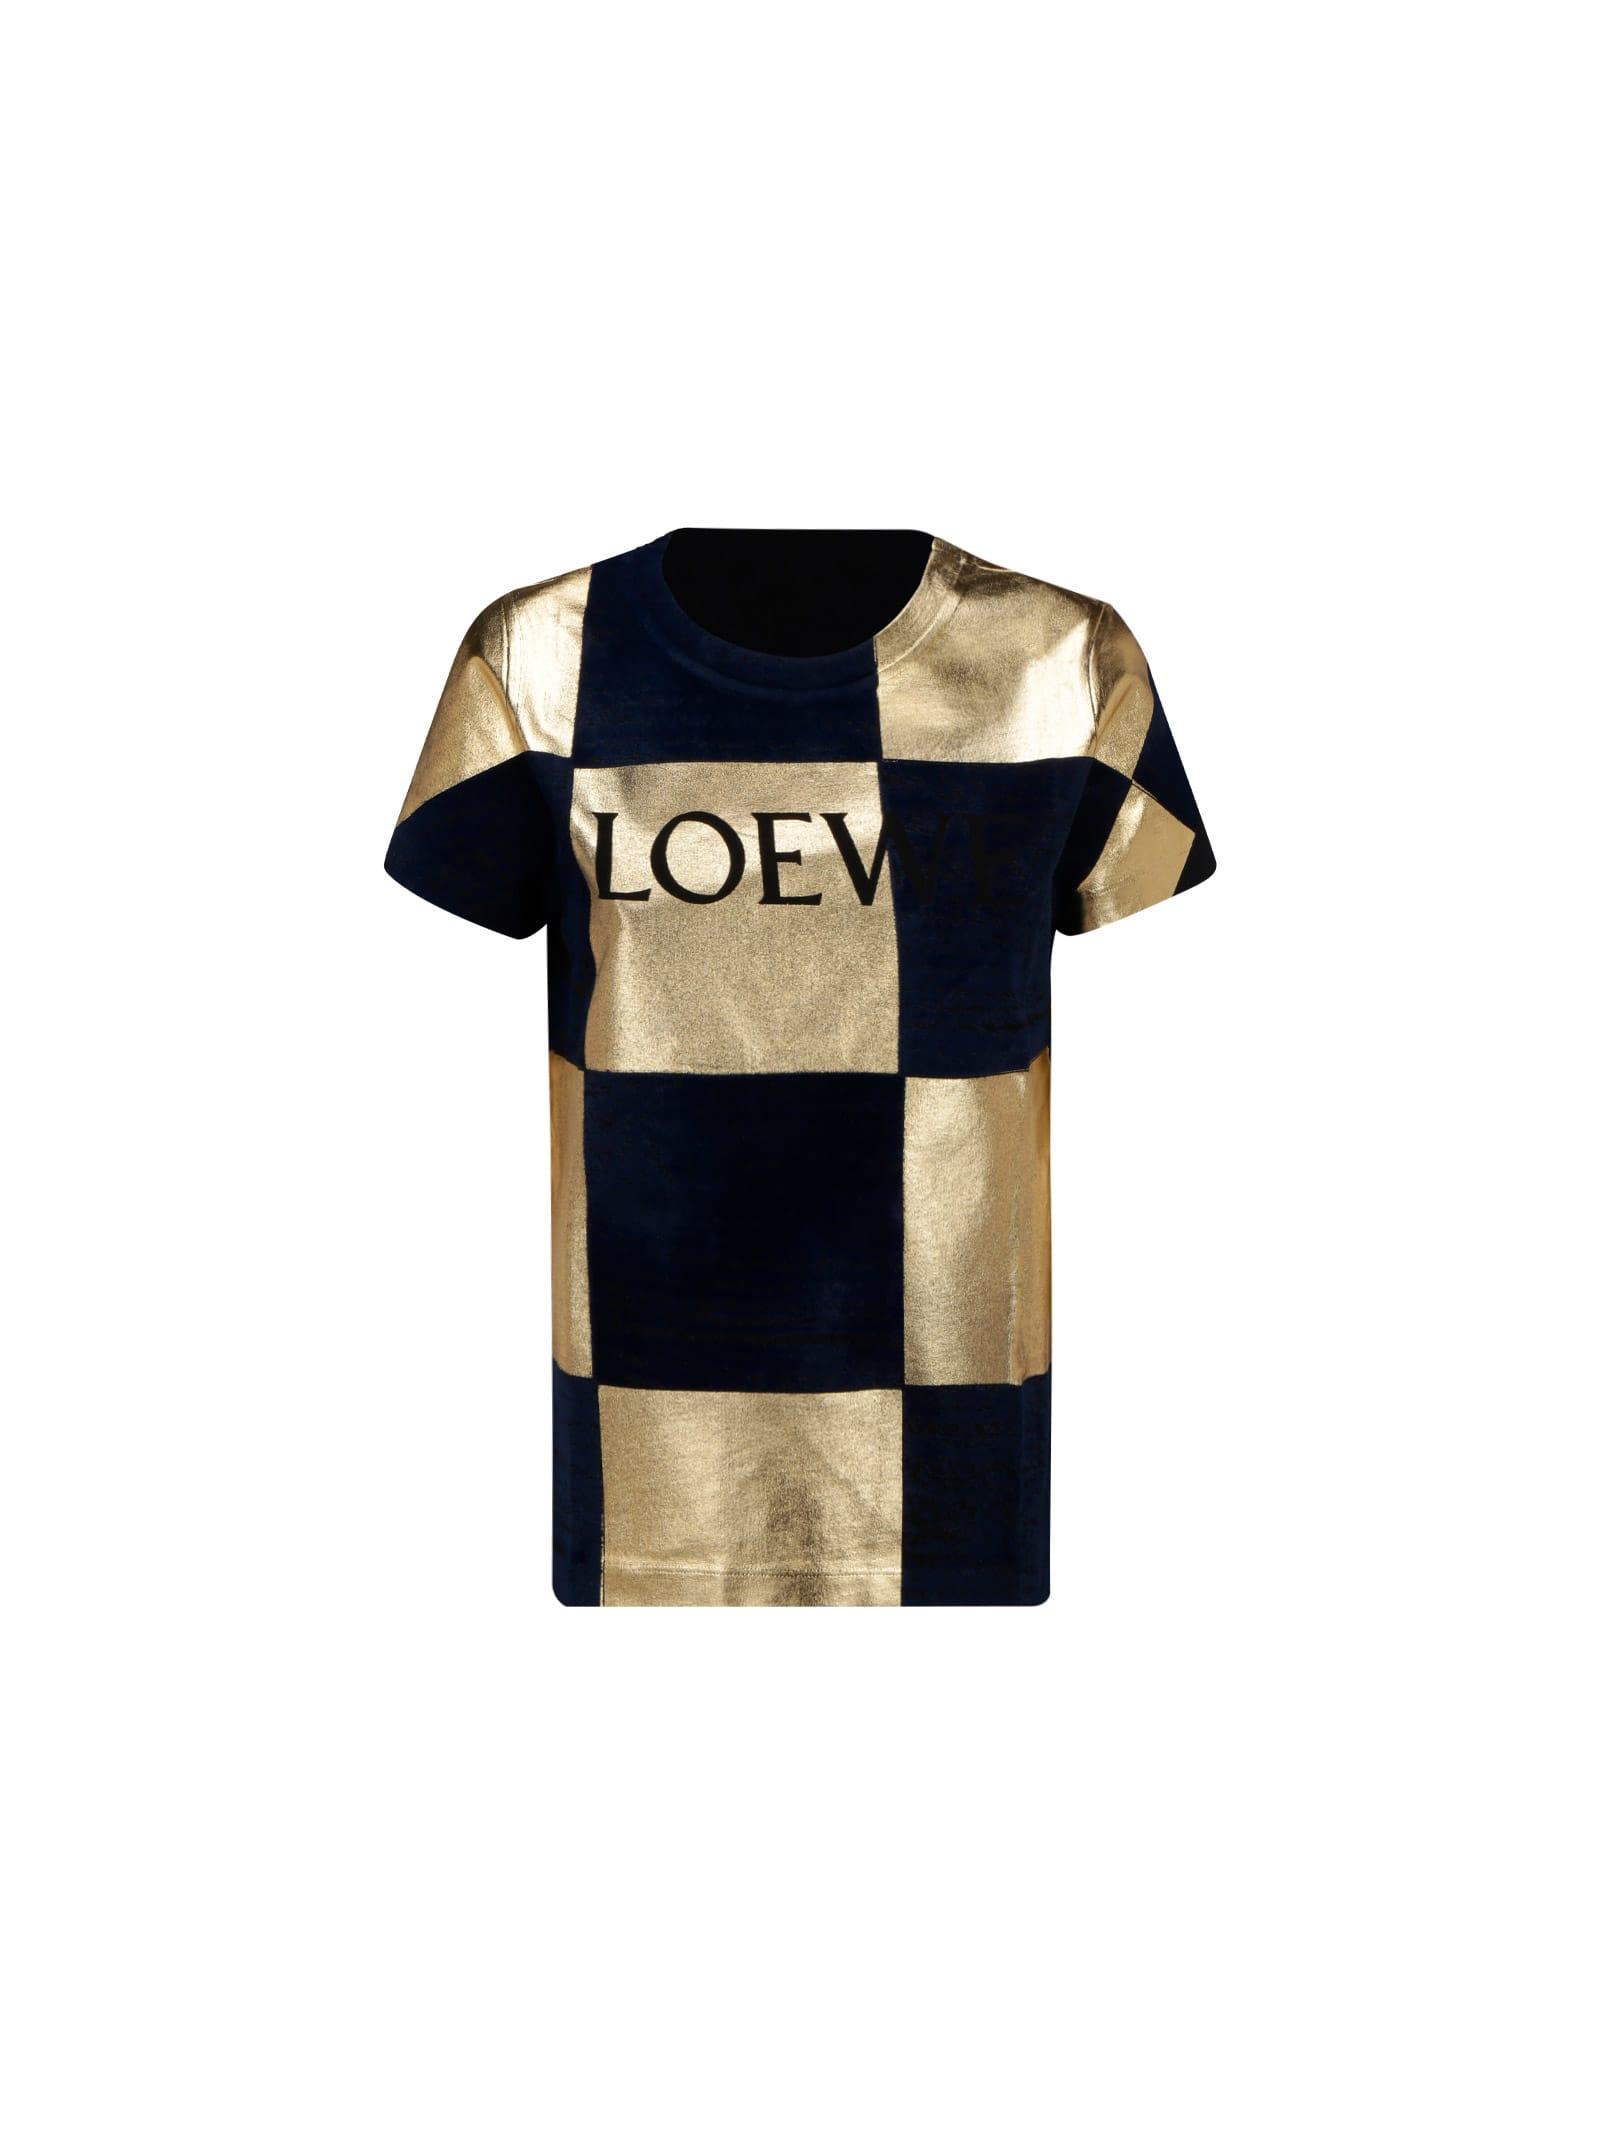 Loewe Cottons DAMIER T-SHIRT